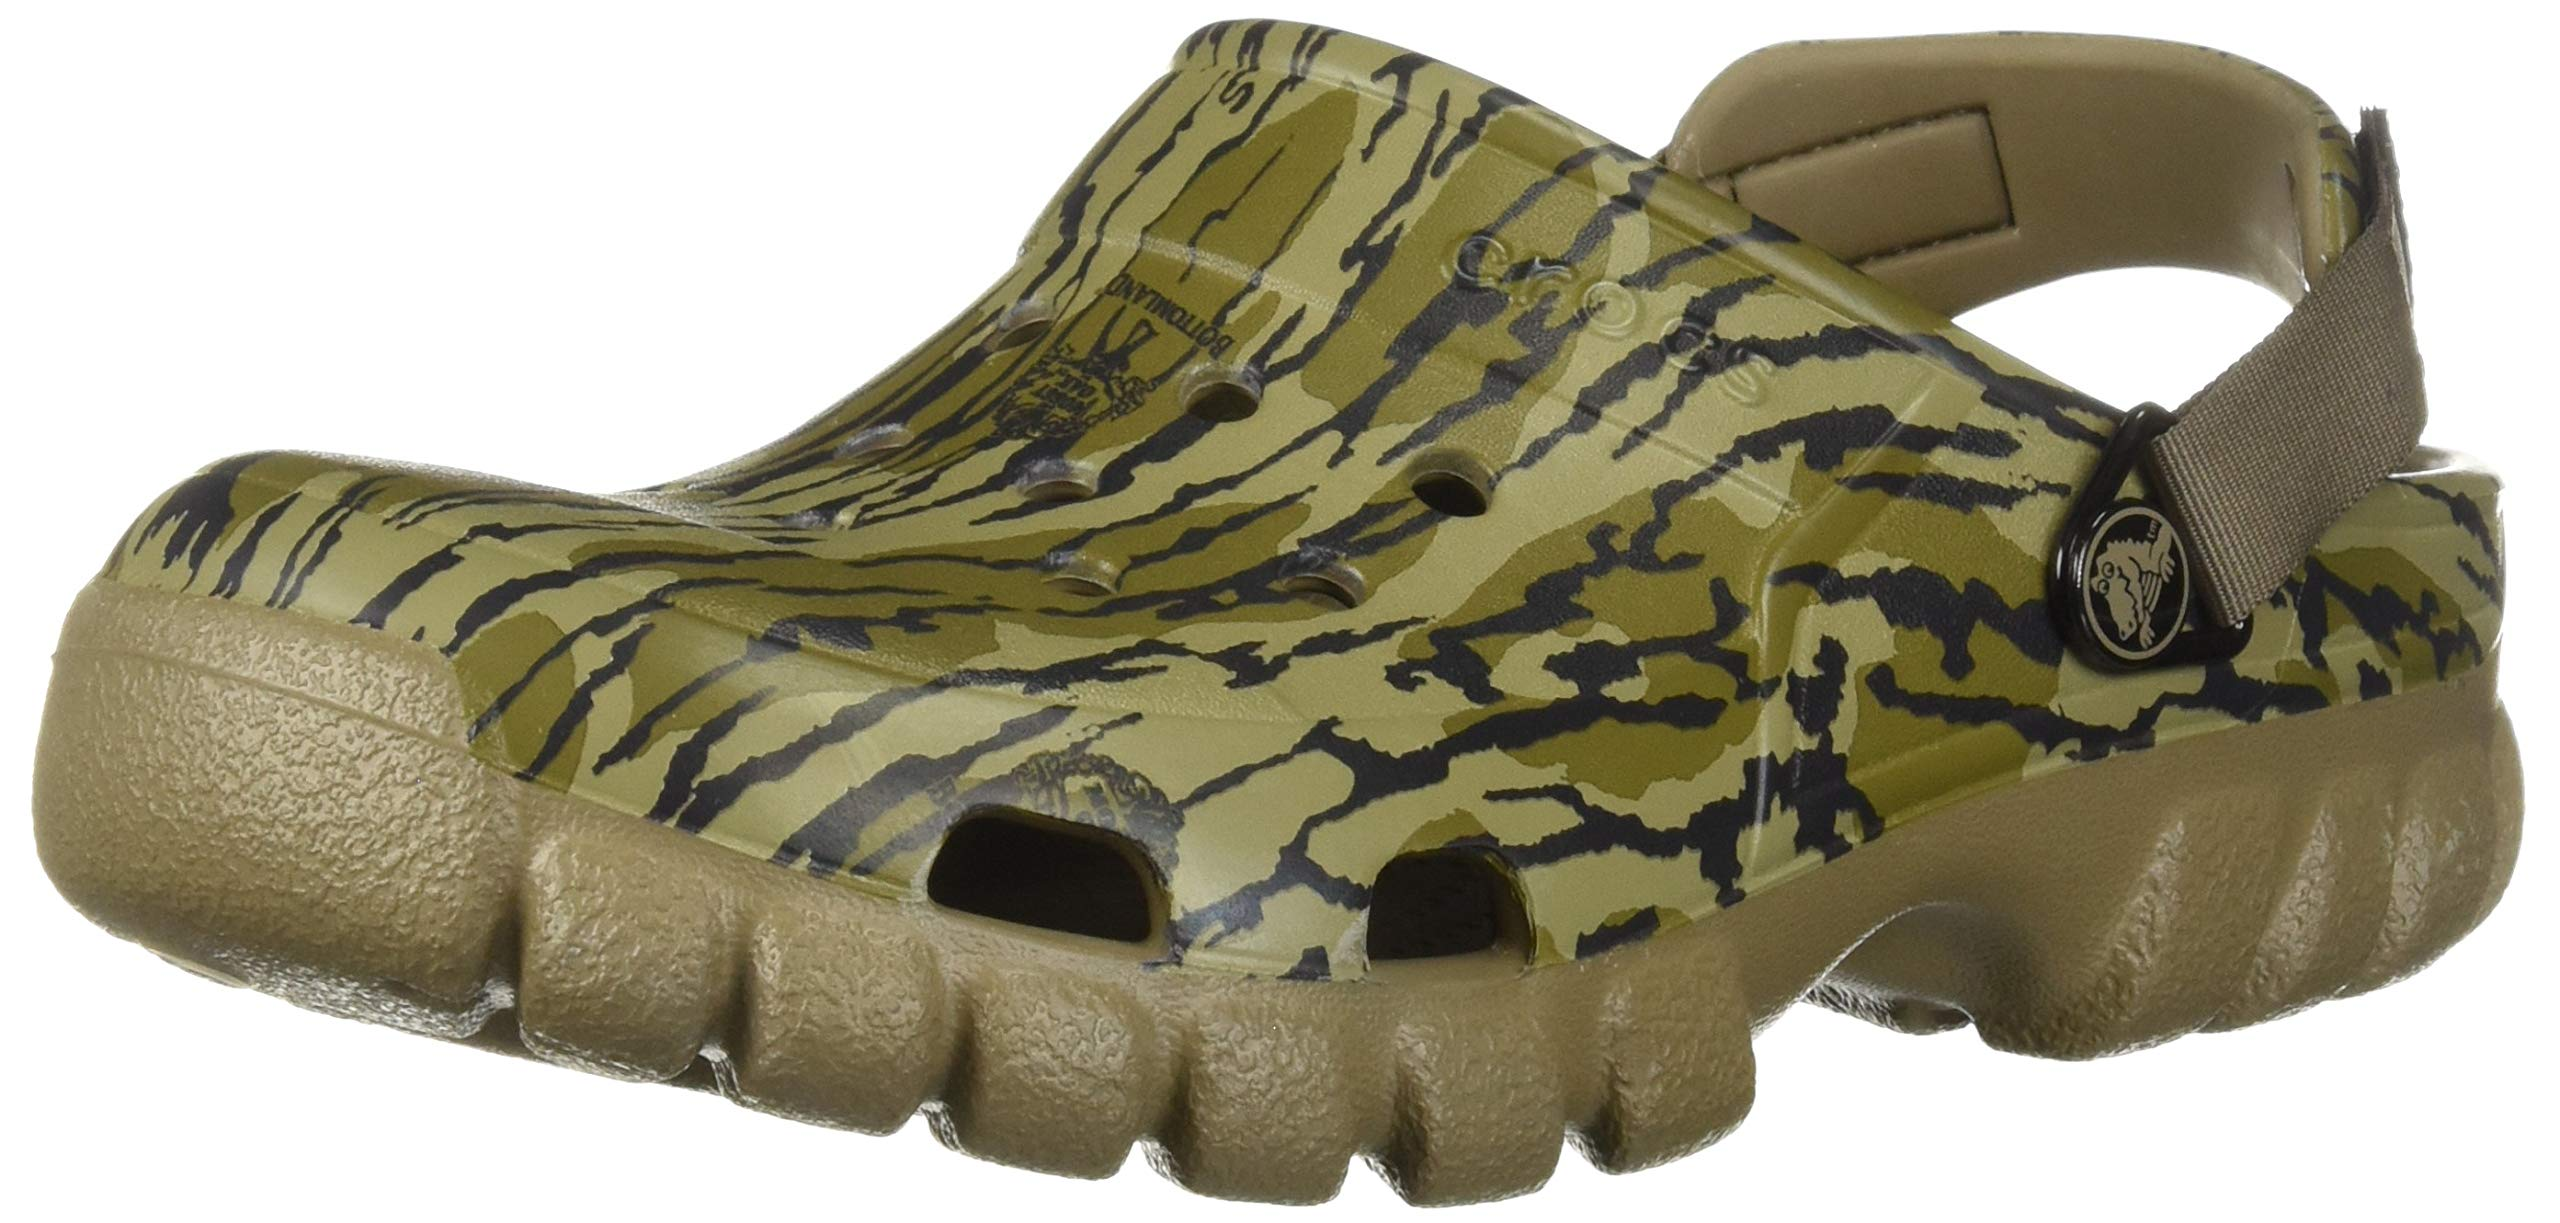 Crocs Offroad Sport Mossy Oak Bottom Clog, Khaki, 11 US Men/ 13 US Women M US